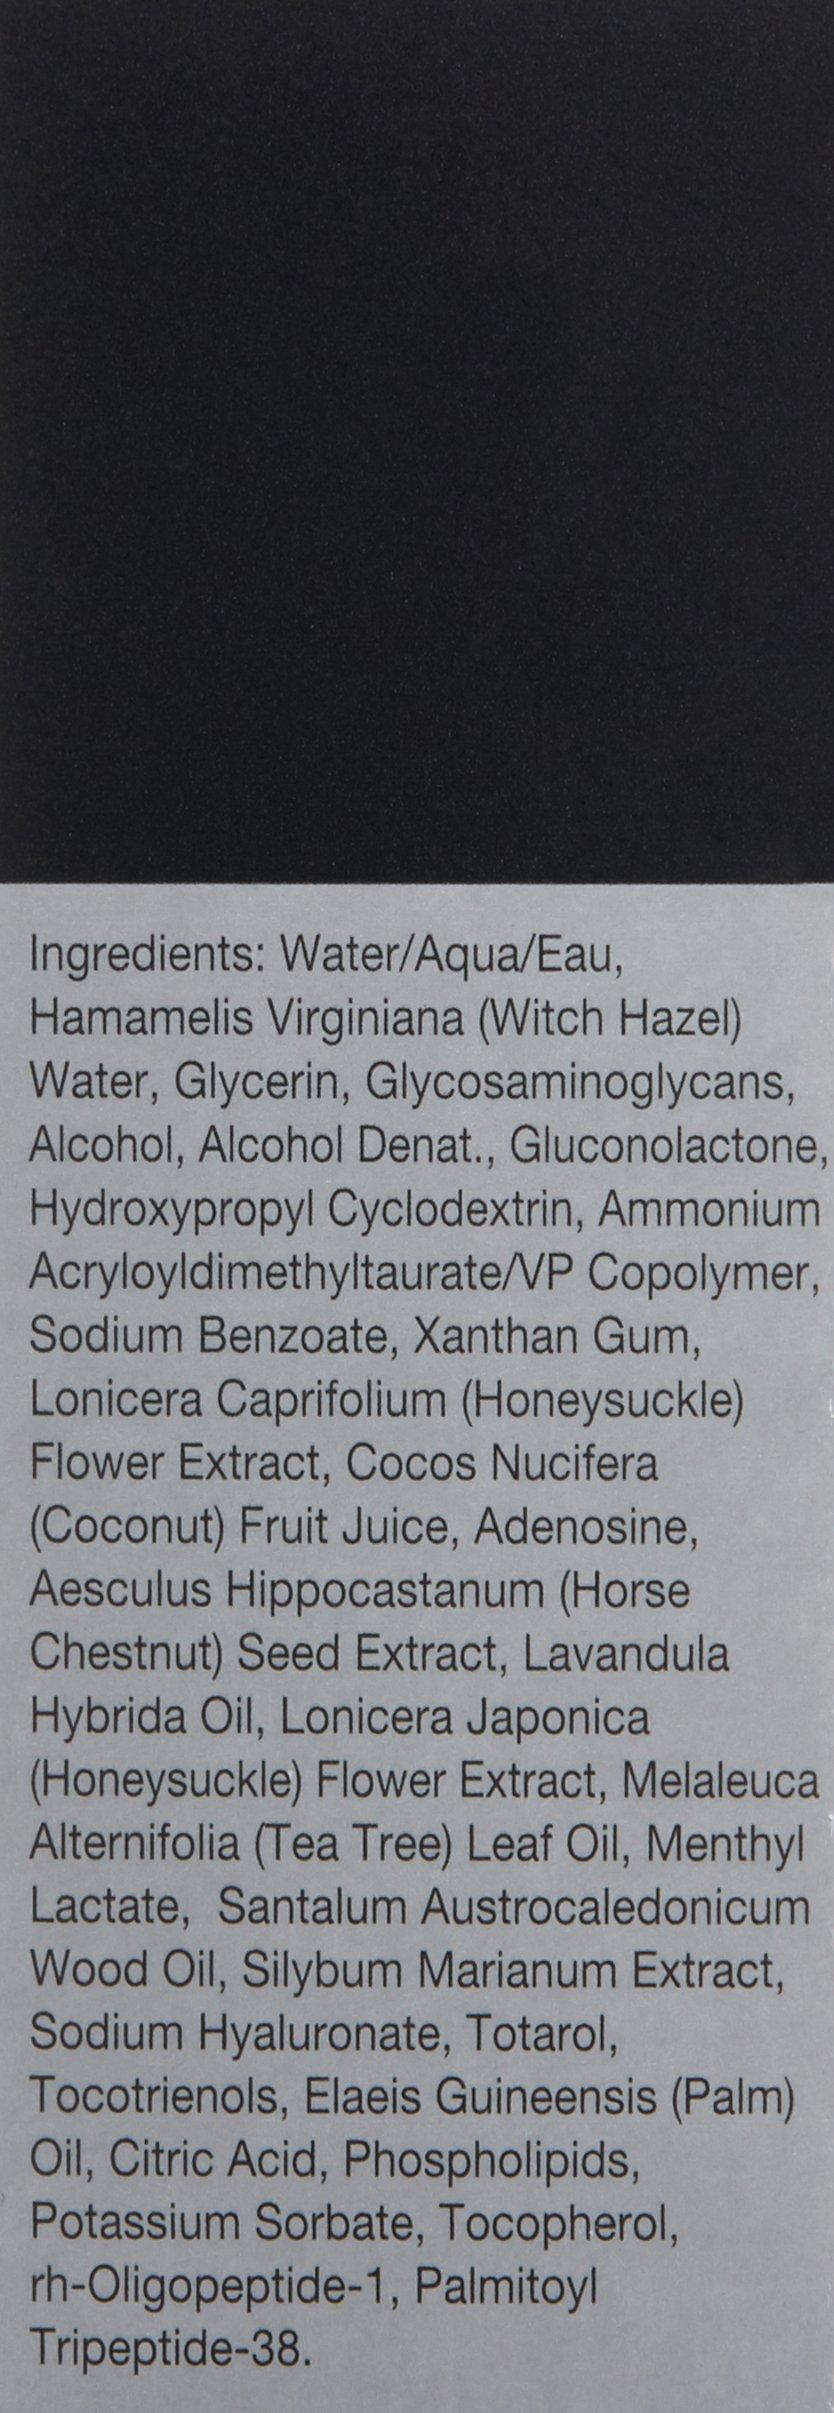 PCA Skin Total Strength Serum, 1.0 Fluid Ounce by PCA SKIN (Image #4)